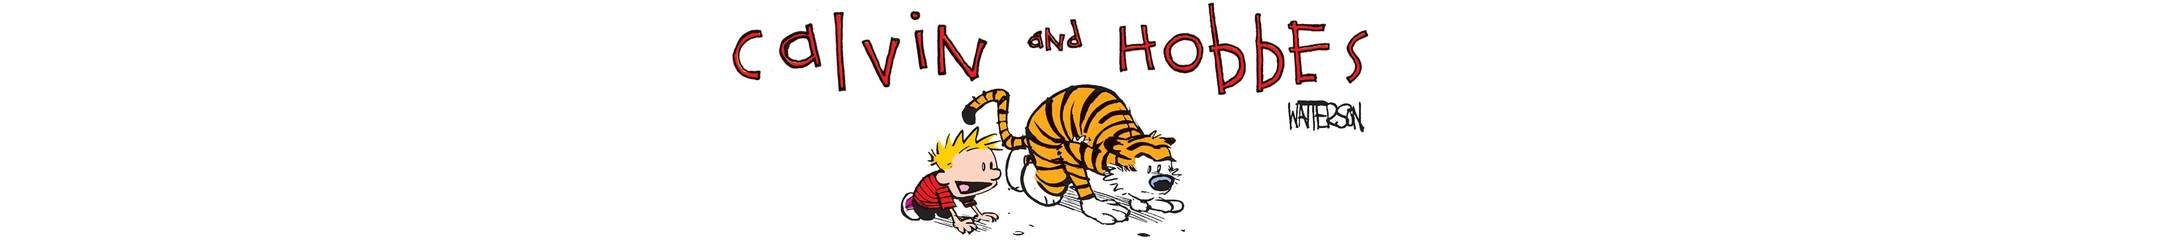 HD Quality Wallpaper | Collection: Comics, 2160x240 Calvin & Hobbes